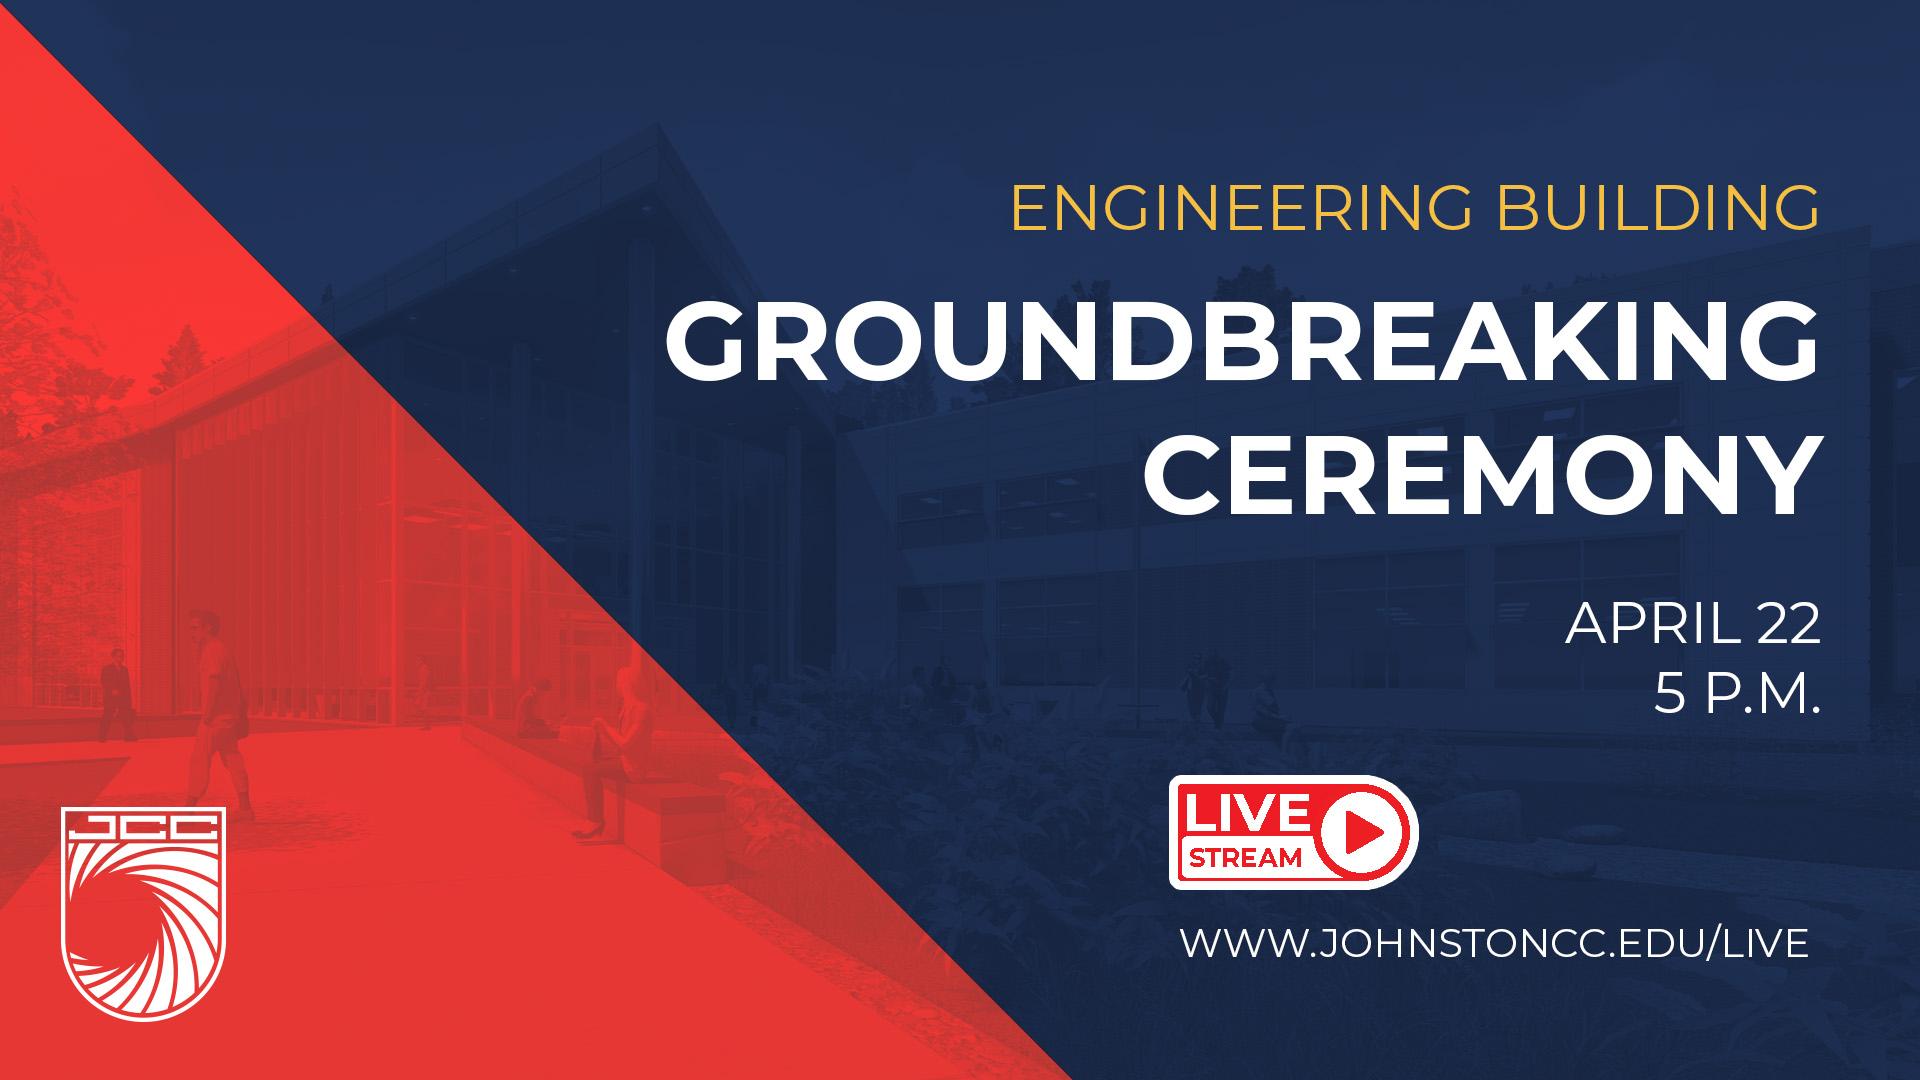 Engineering Building Groundbreaking Ceremony April 22 5 PM